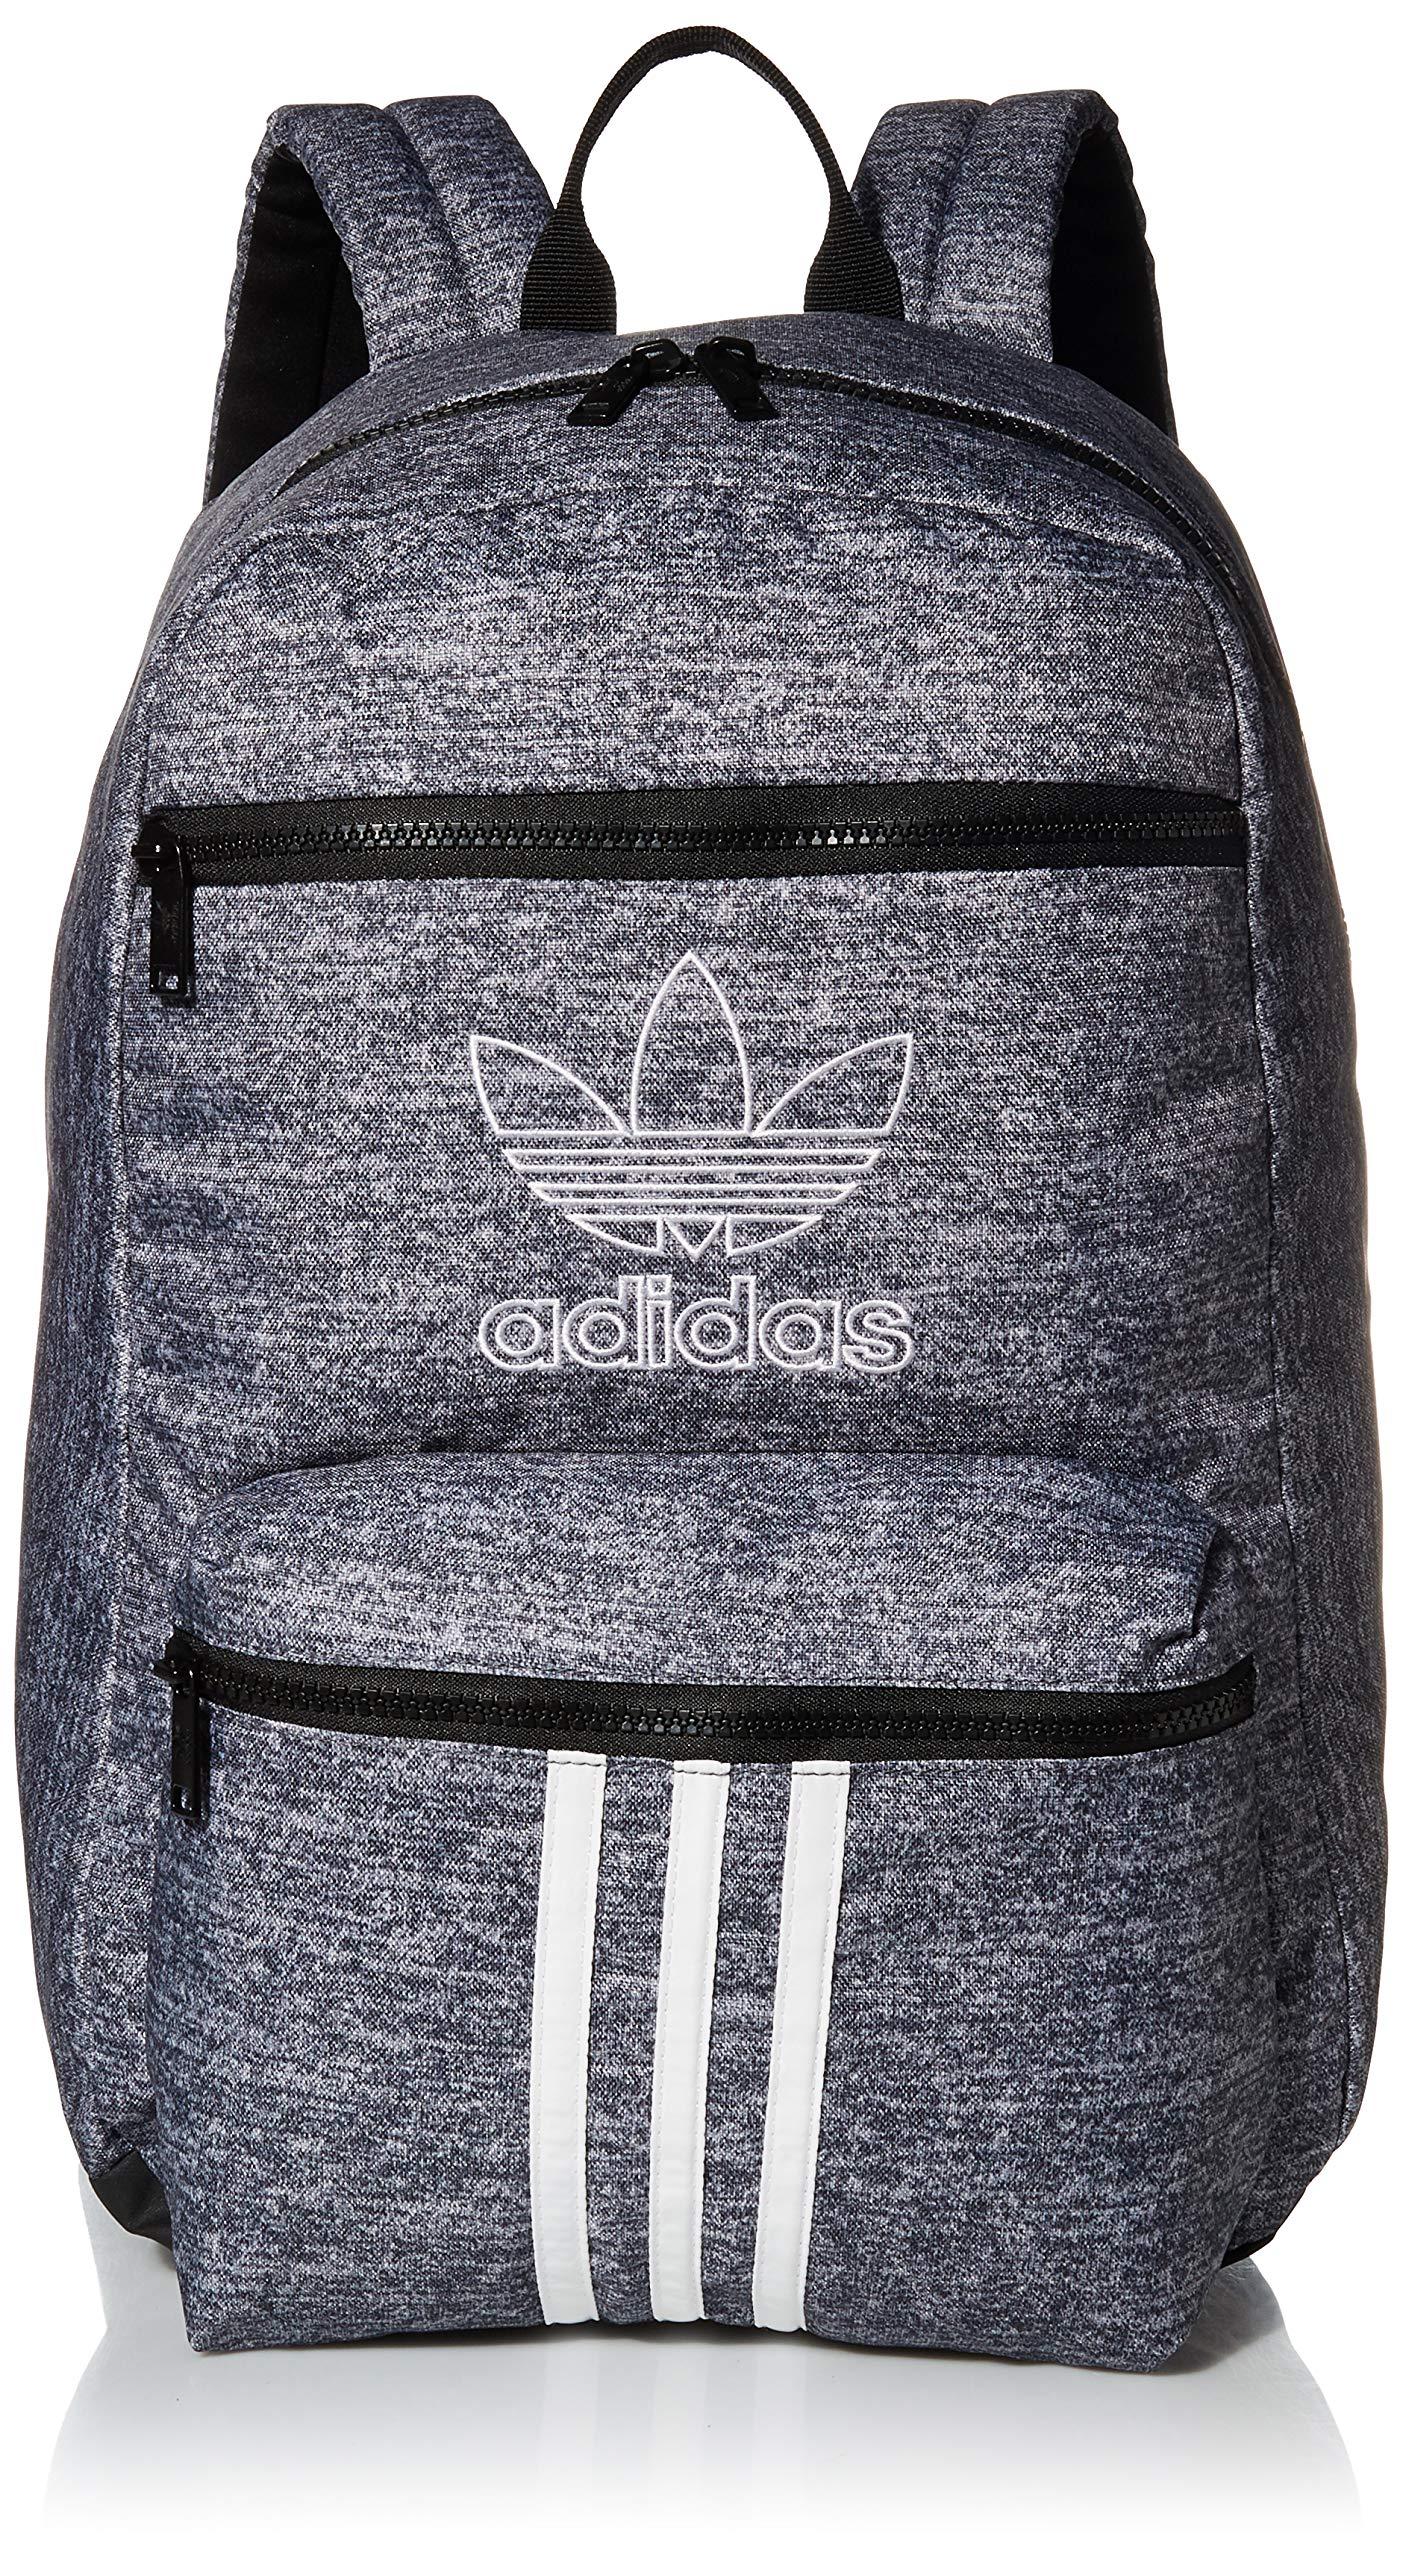 adidas Originals Unisex National 3-Stripes Backpack, Onix Jersey/Black, ONE SIZE by adidas Originals